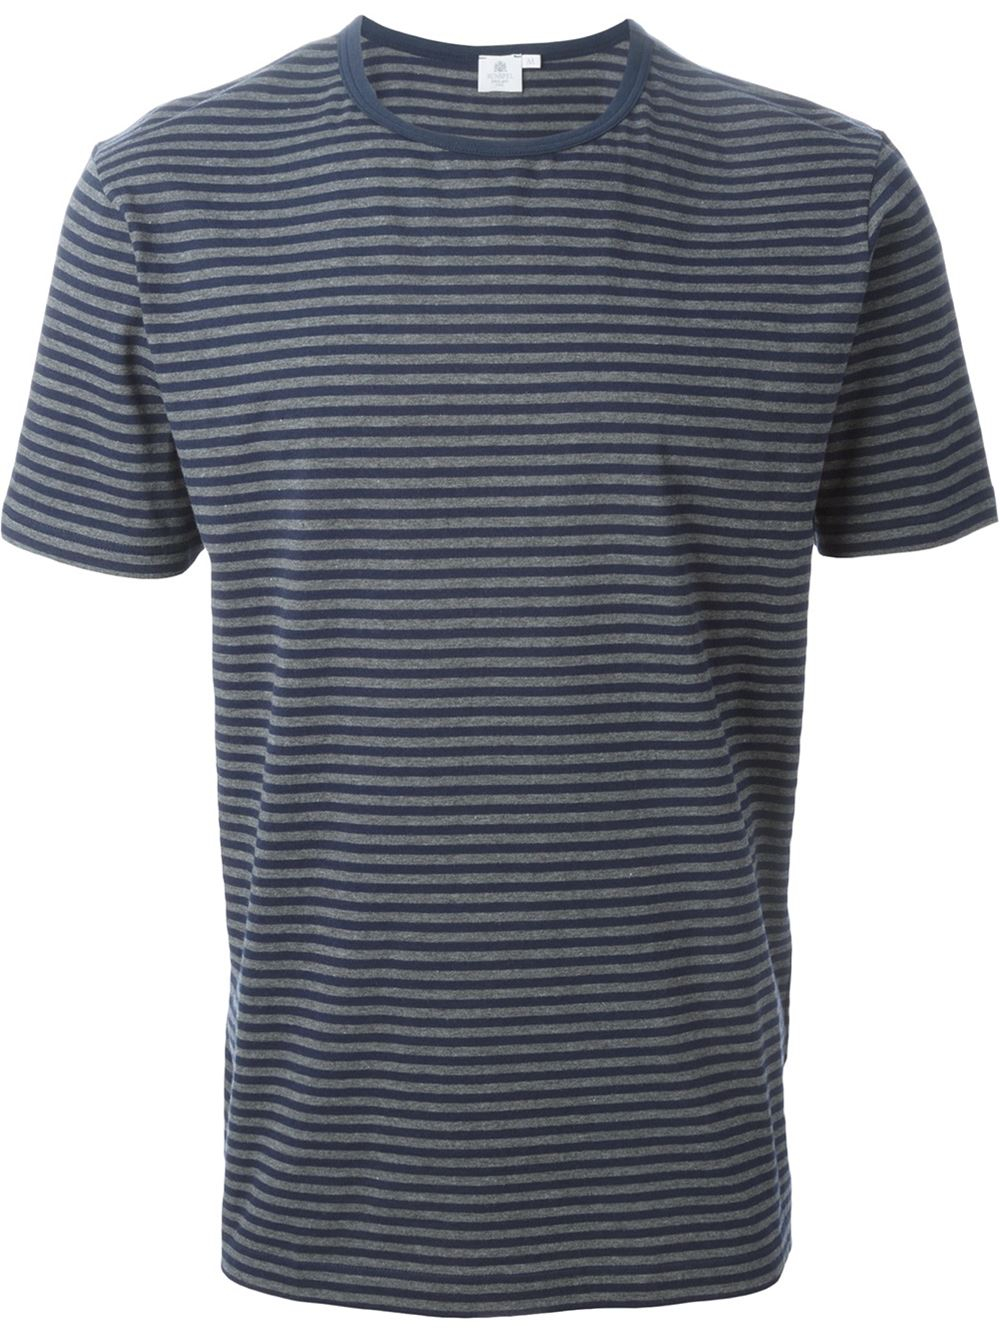 Sunspel striped t shirt in gray for men grey lyst Grey striped t shirt